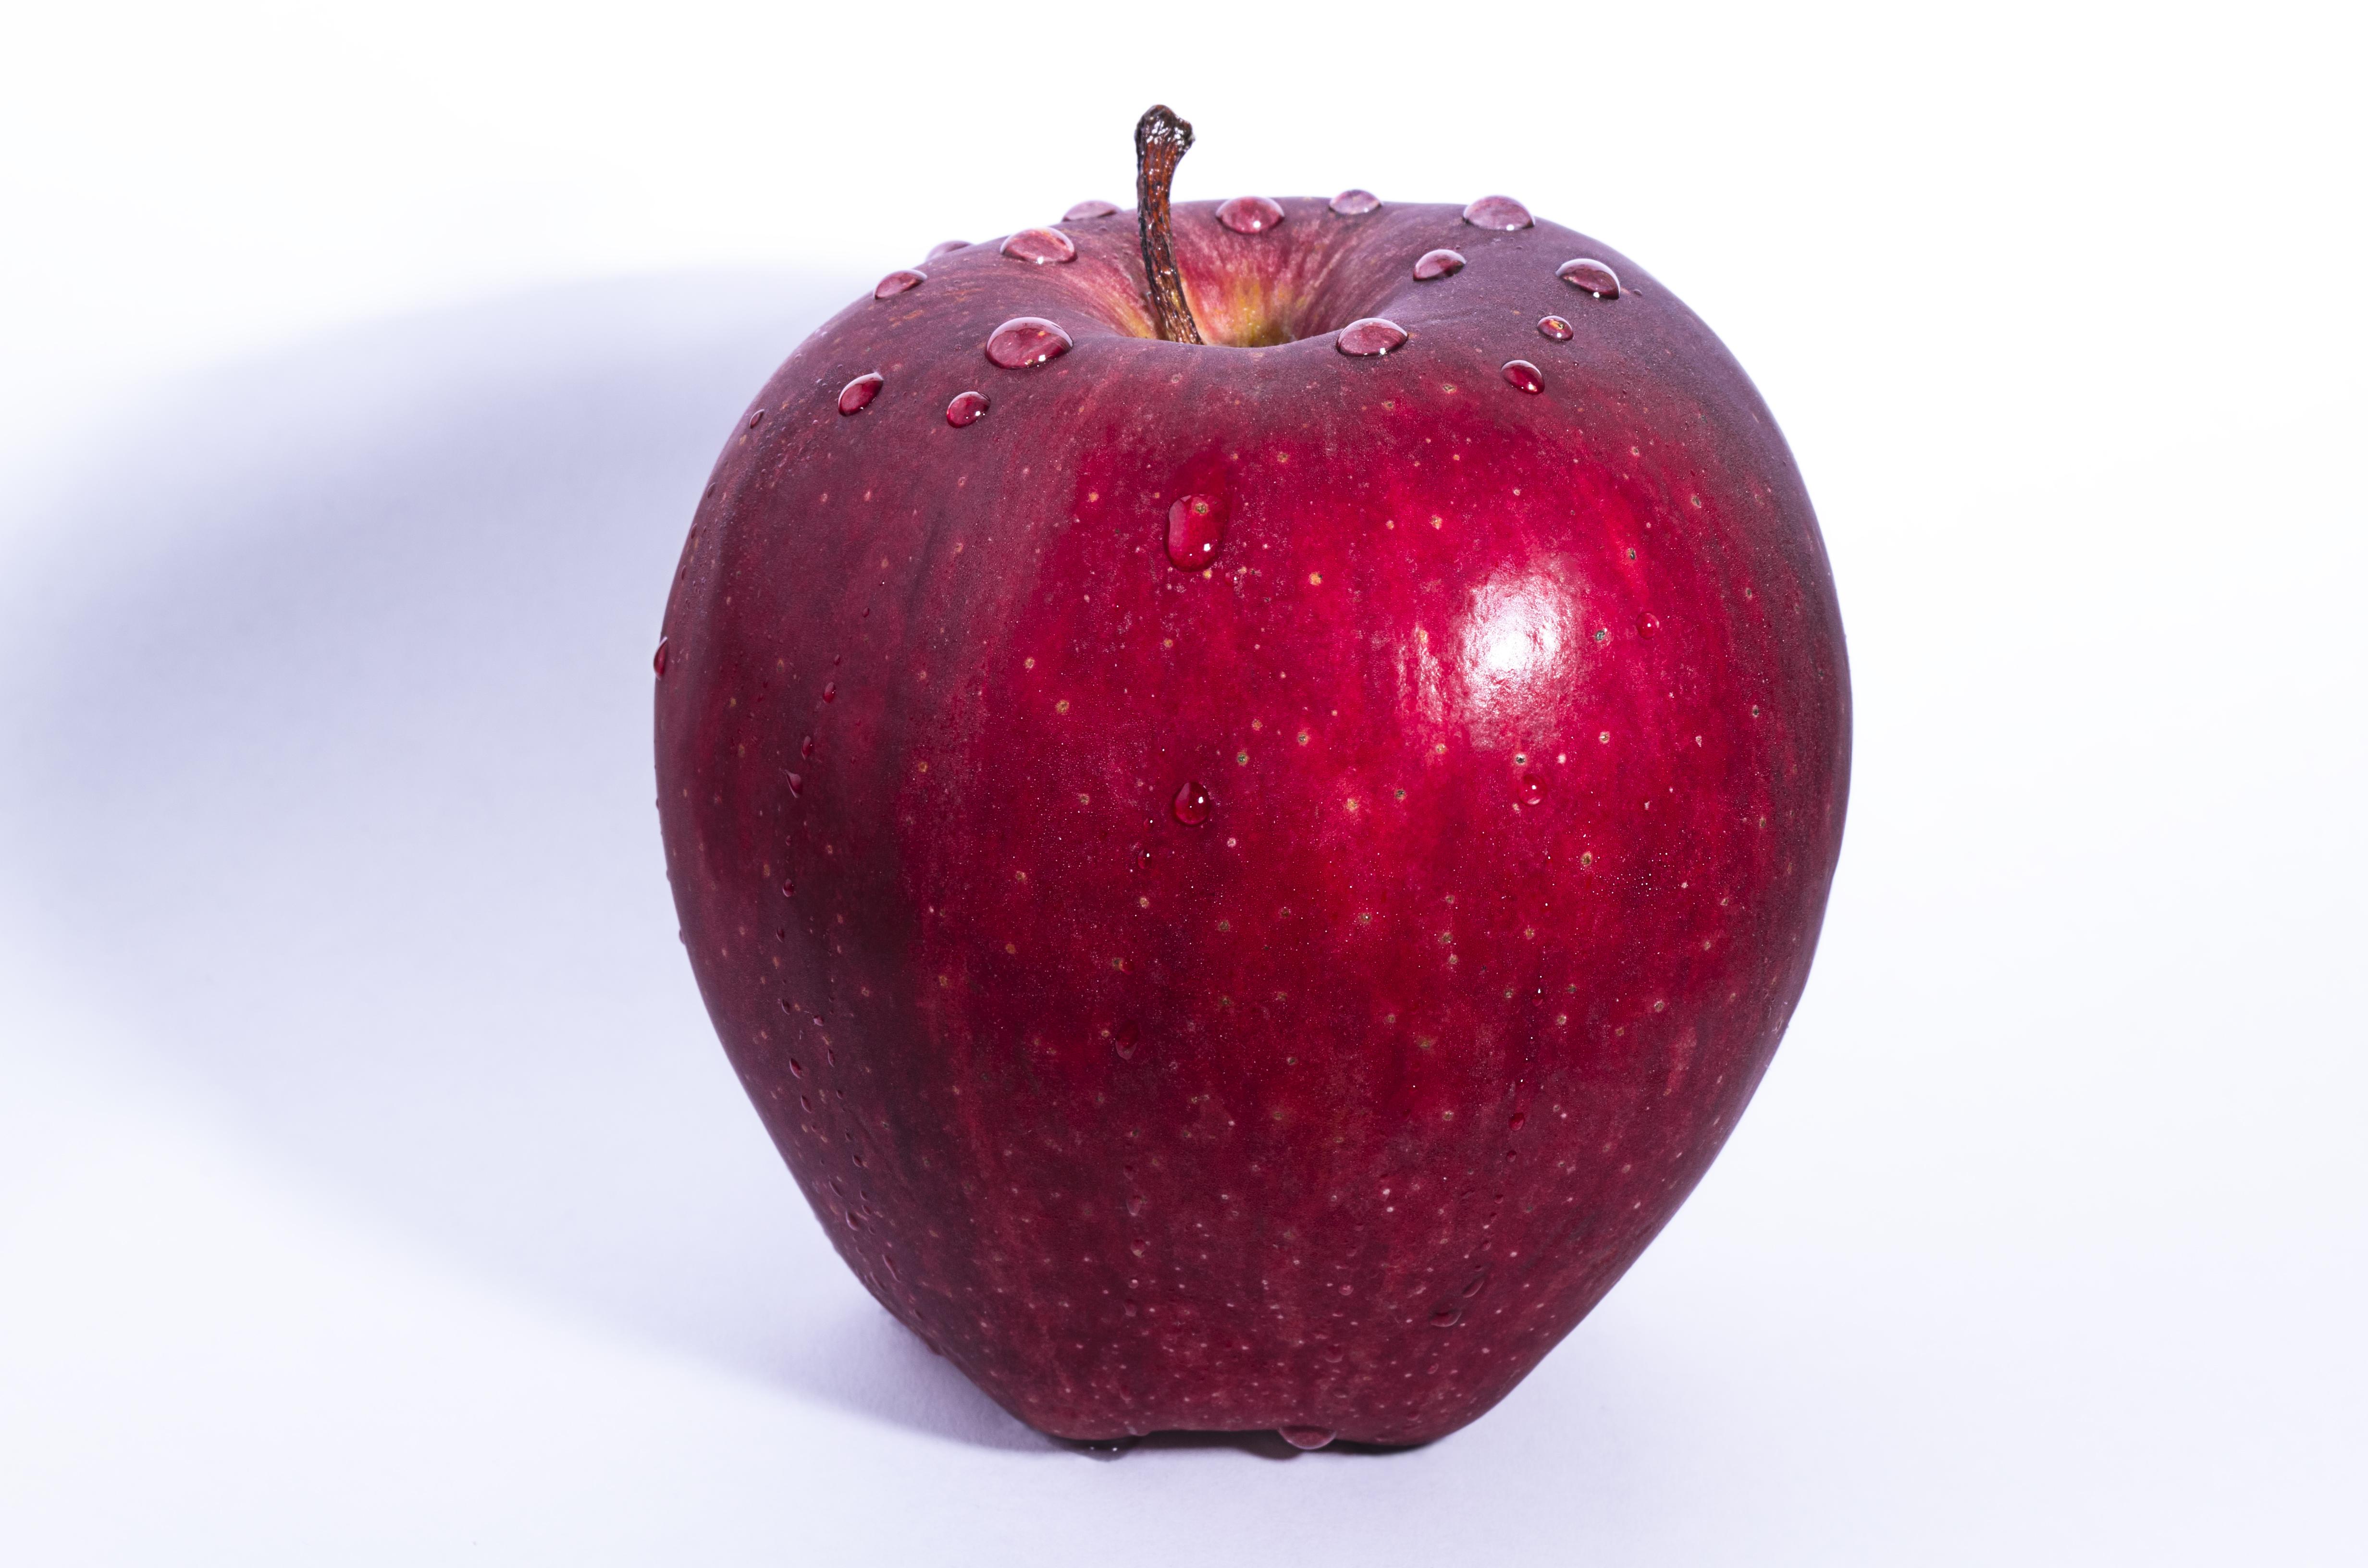 Free stock photos of apple · Pexels